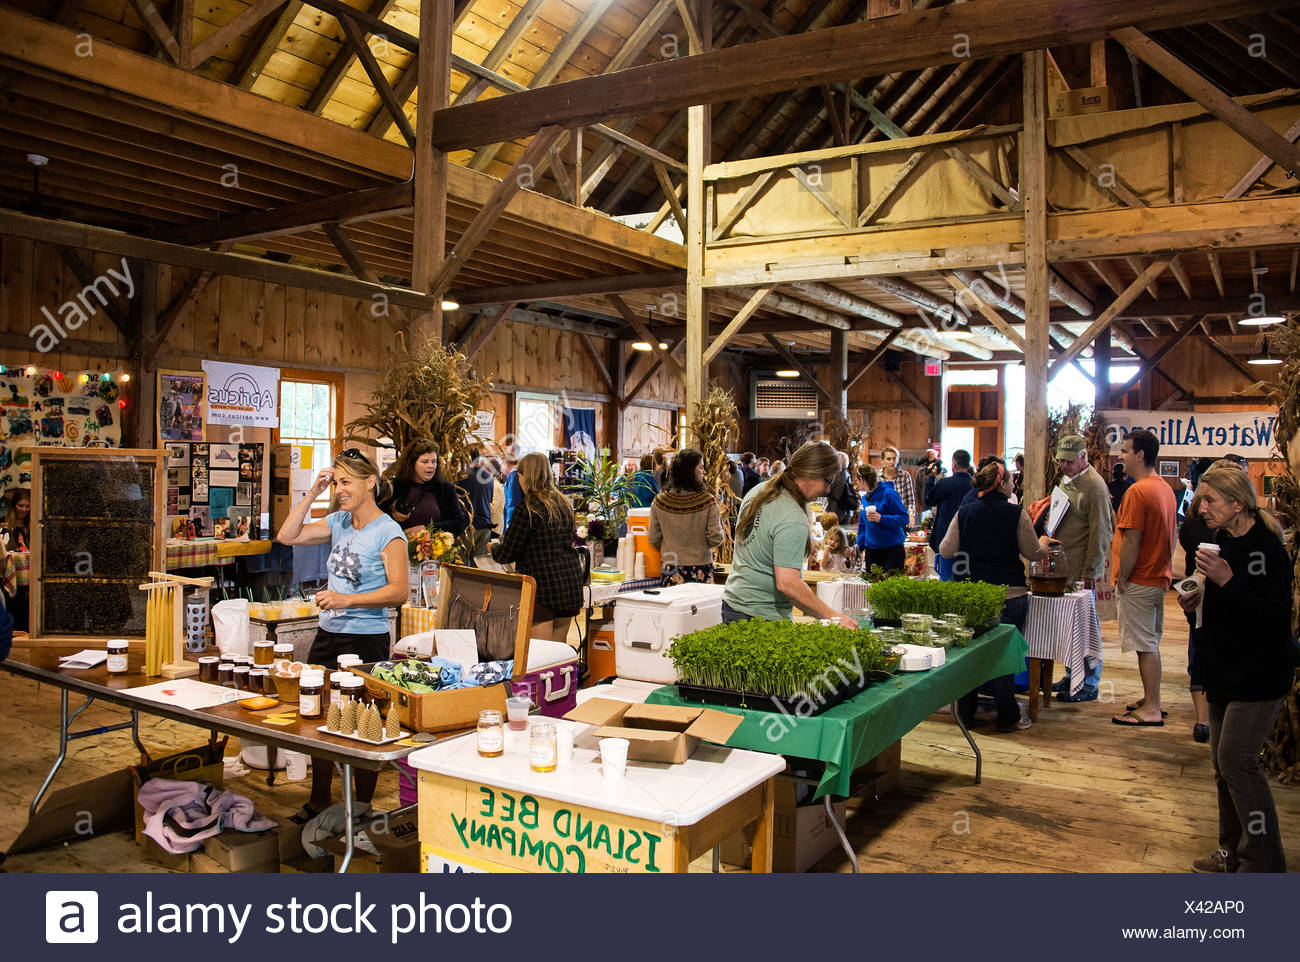 Exhibitors at the Martha's Vineyard Living Local Harvest Fest, West Tisbury, Massachusetts, USA - Stock Image